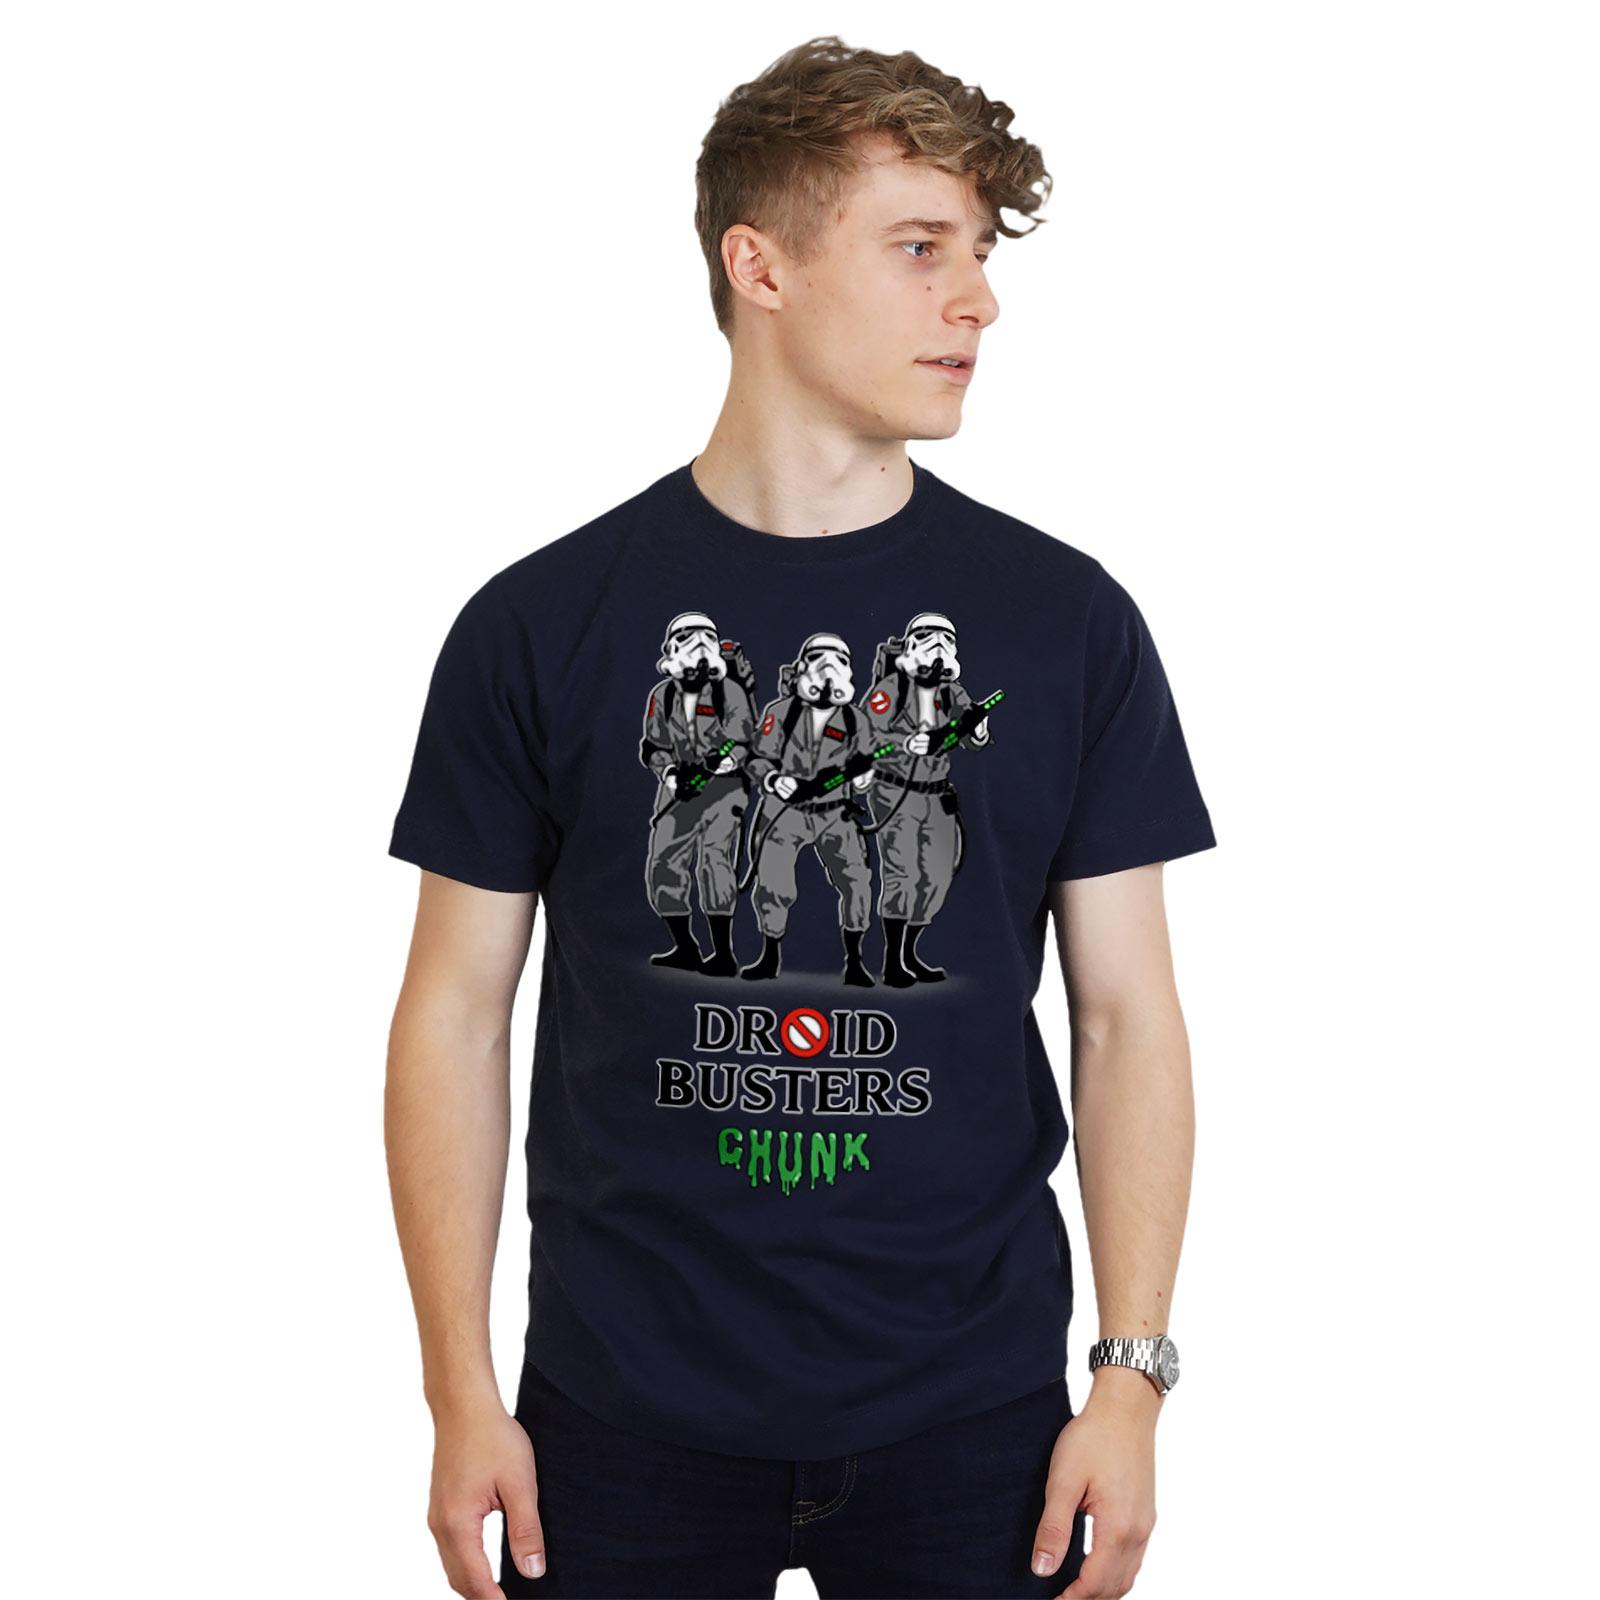 Droidbusters T-Shirt für Star Wars Fans blau